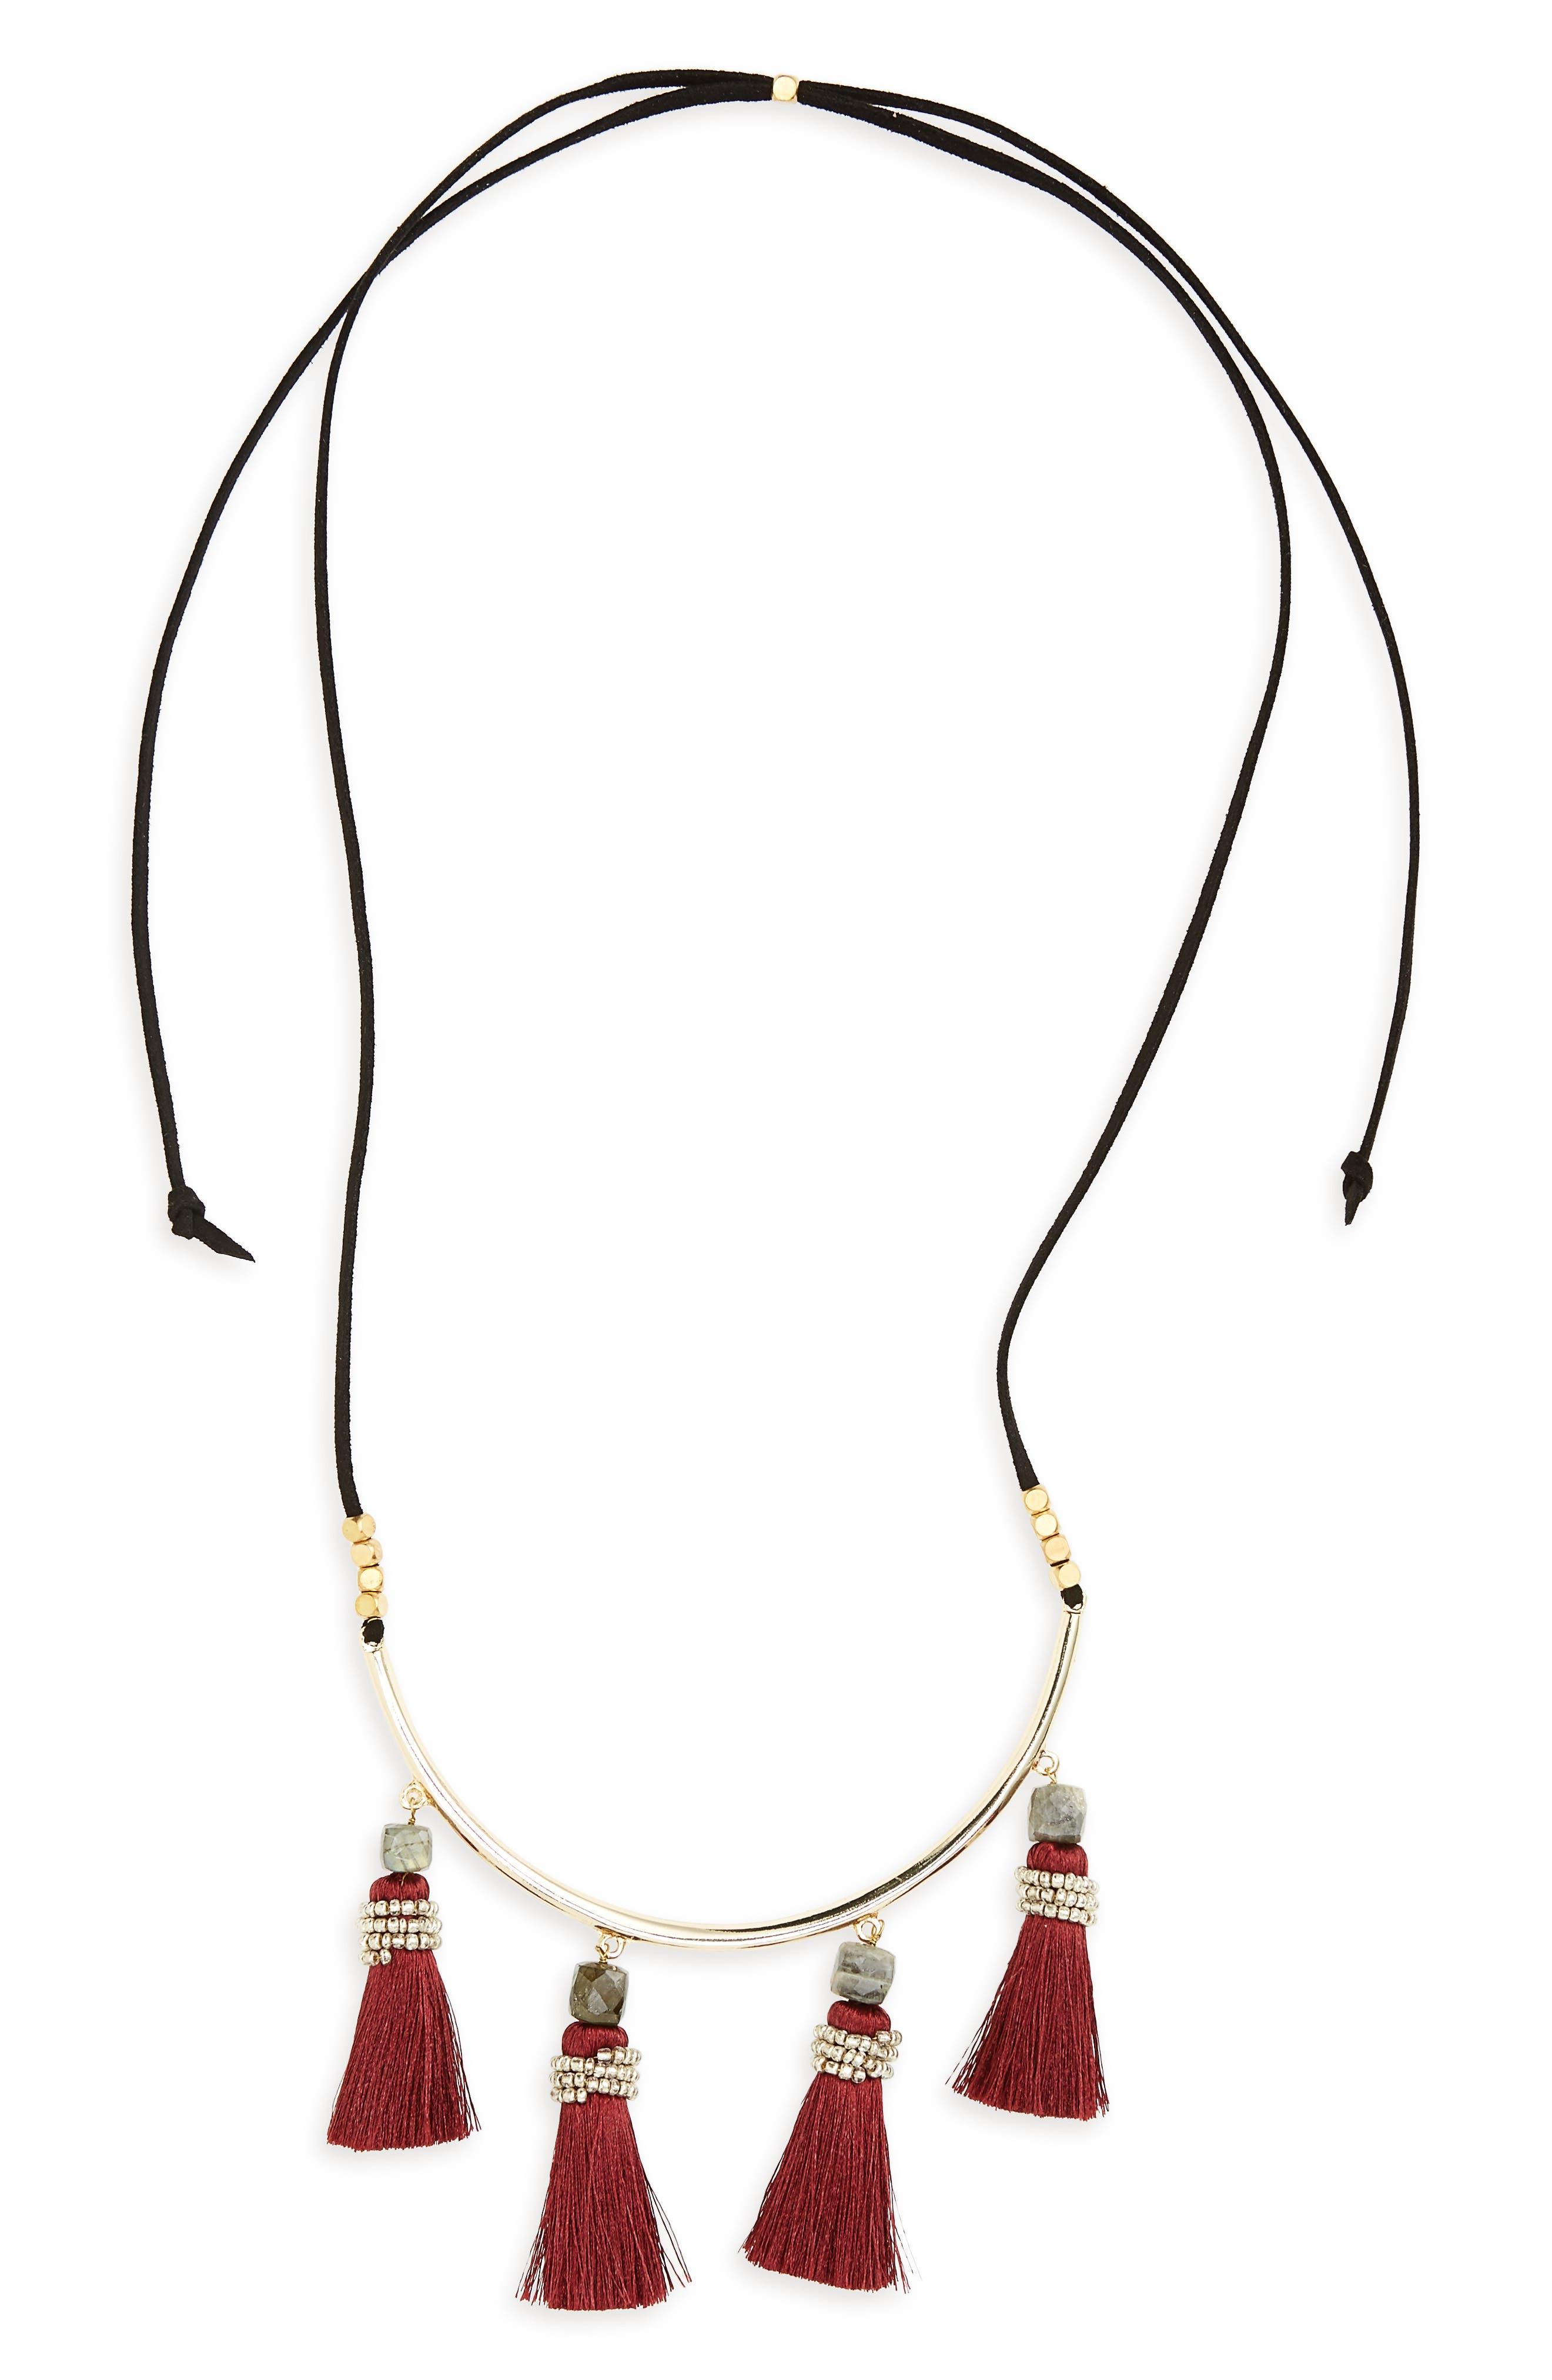 Main Image - Panacea Tassel Necklace